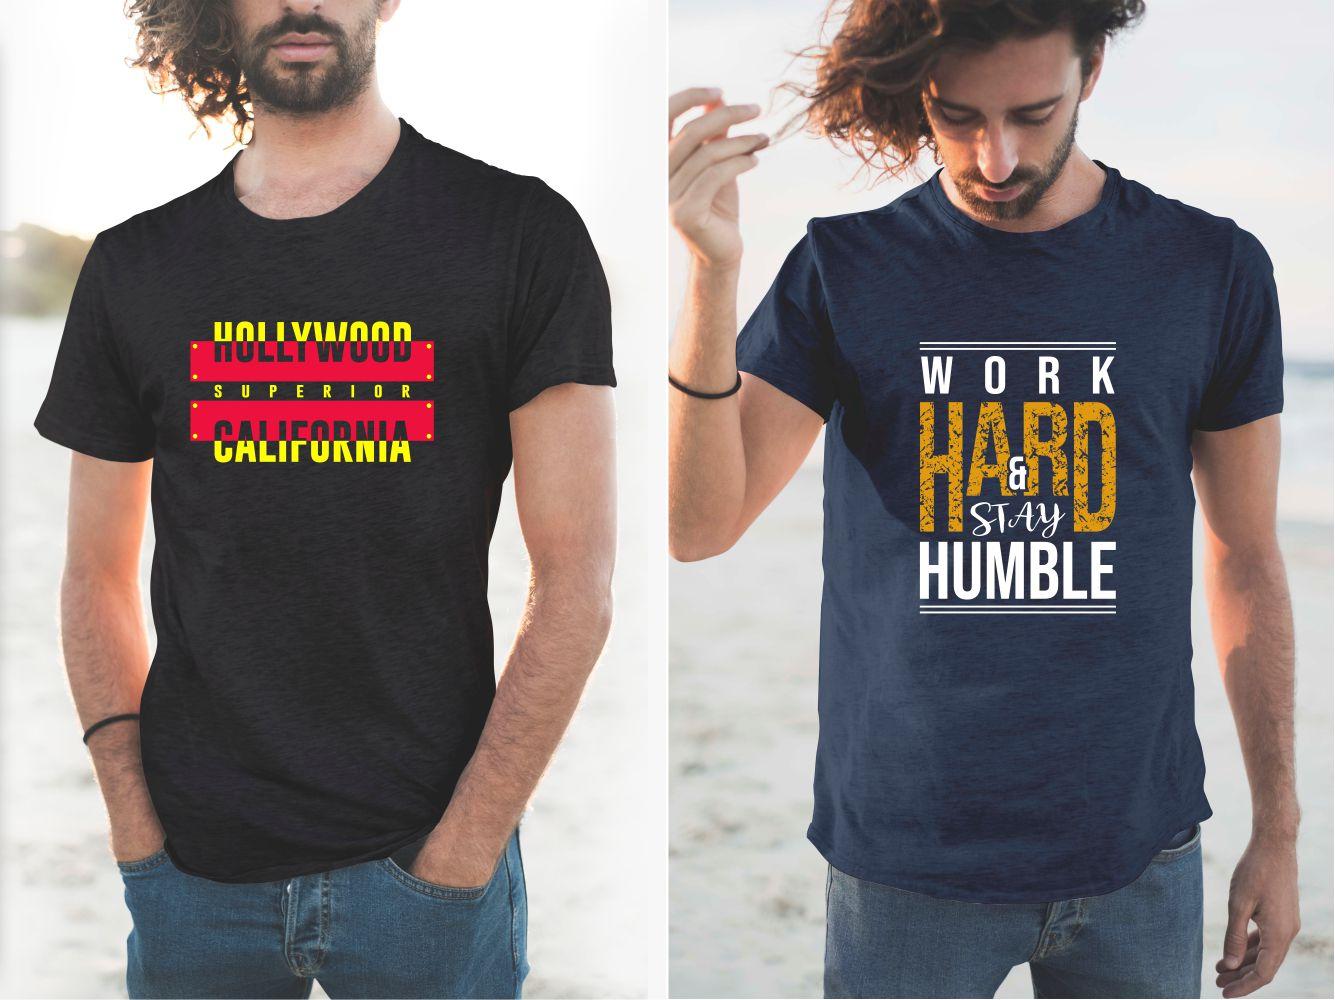 106 Urban T-shirt Designs Collection - 35 1